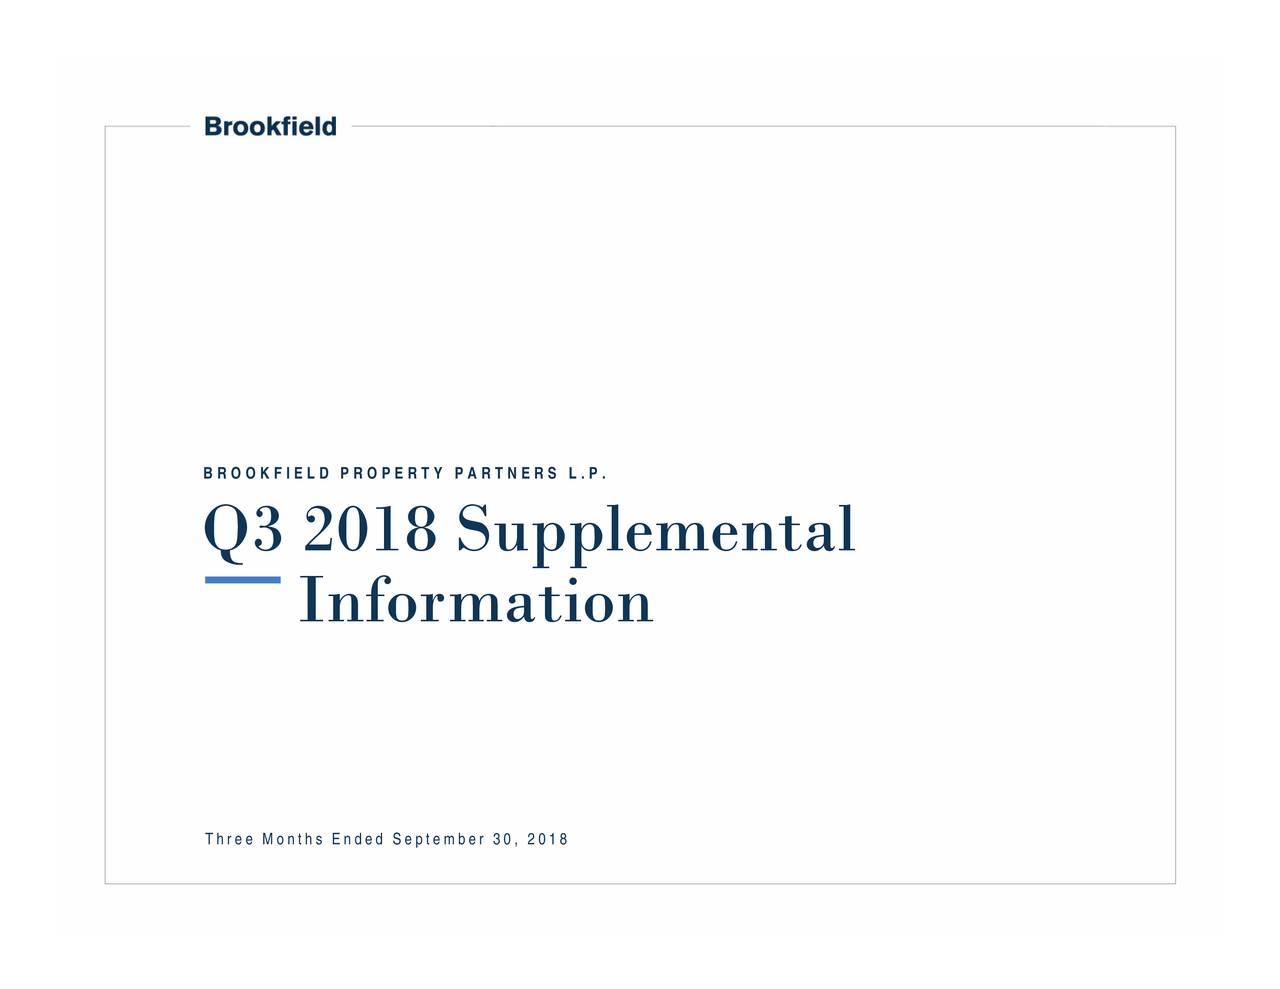 Q3 2018 Supplemental Information T h r e e M o n t h s E n d e d S e p t e m b e r 3 0 , 2 0 1 8